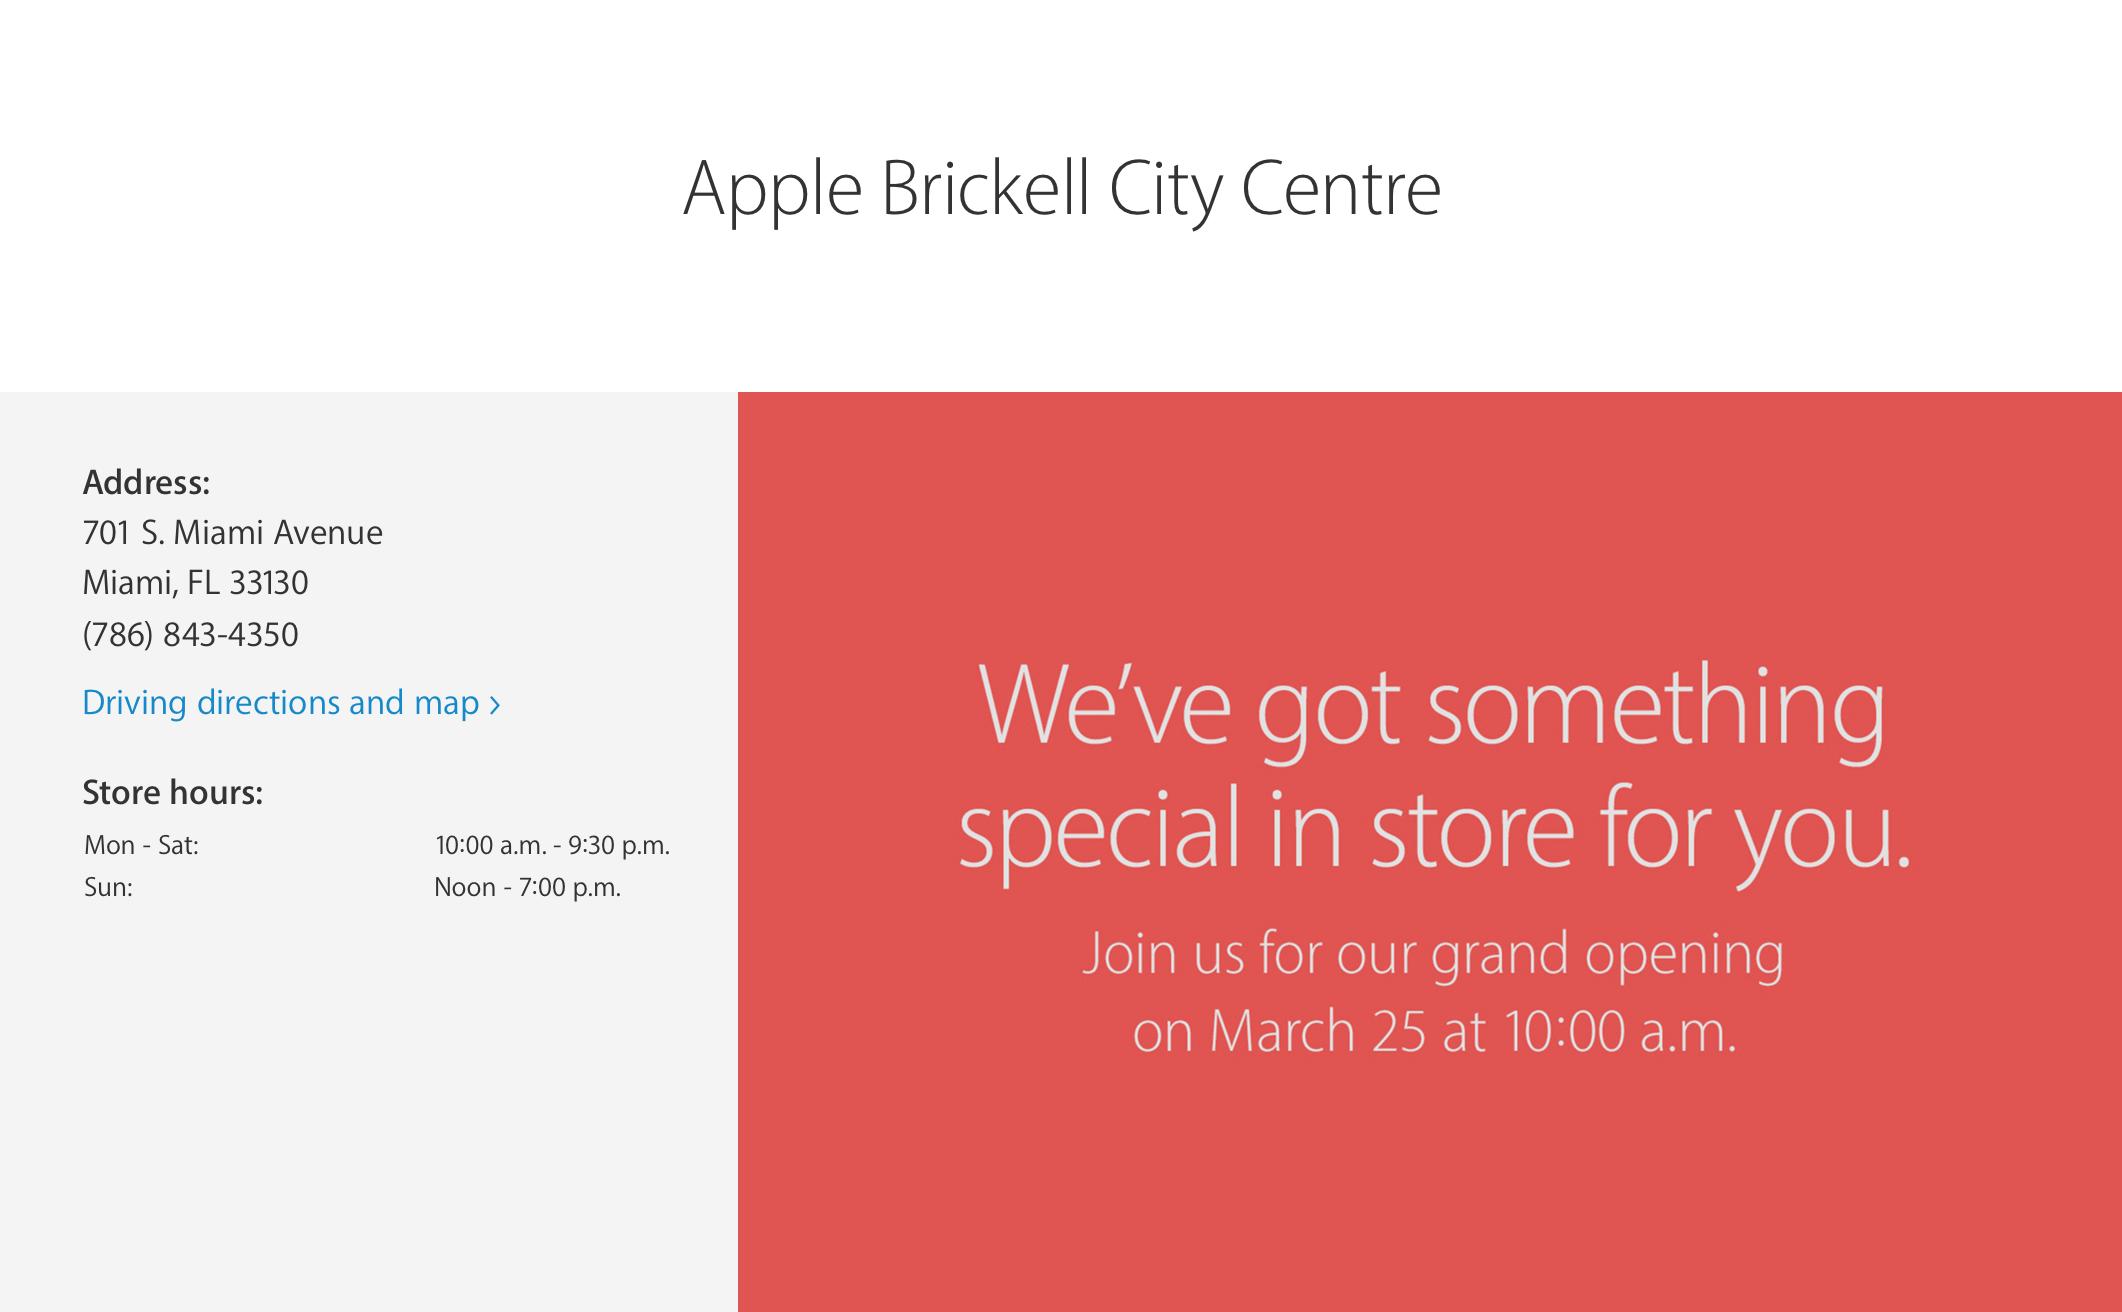 Apple 마이애미에 새로운 직영점 Apple Brickell City Centre 오픈